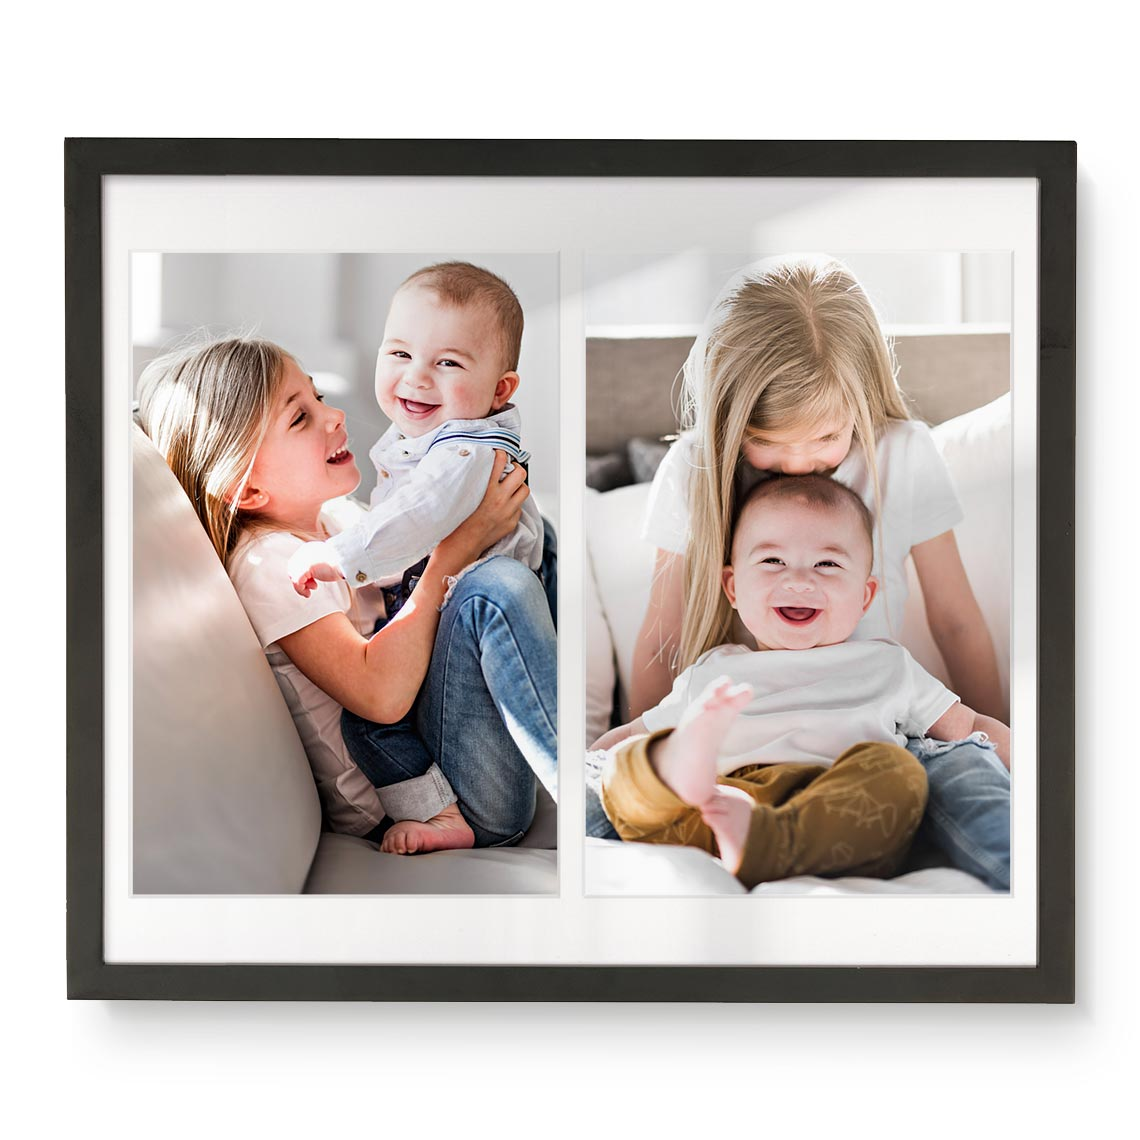 40x47cm Framed Print (2x Images)